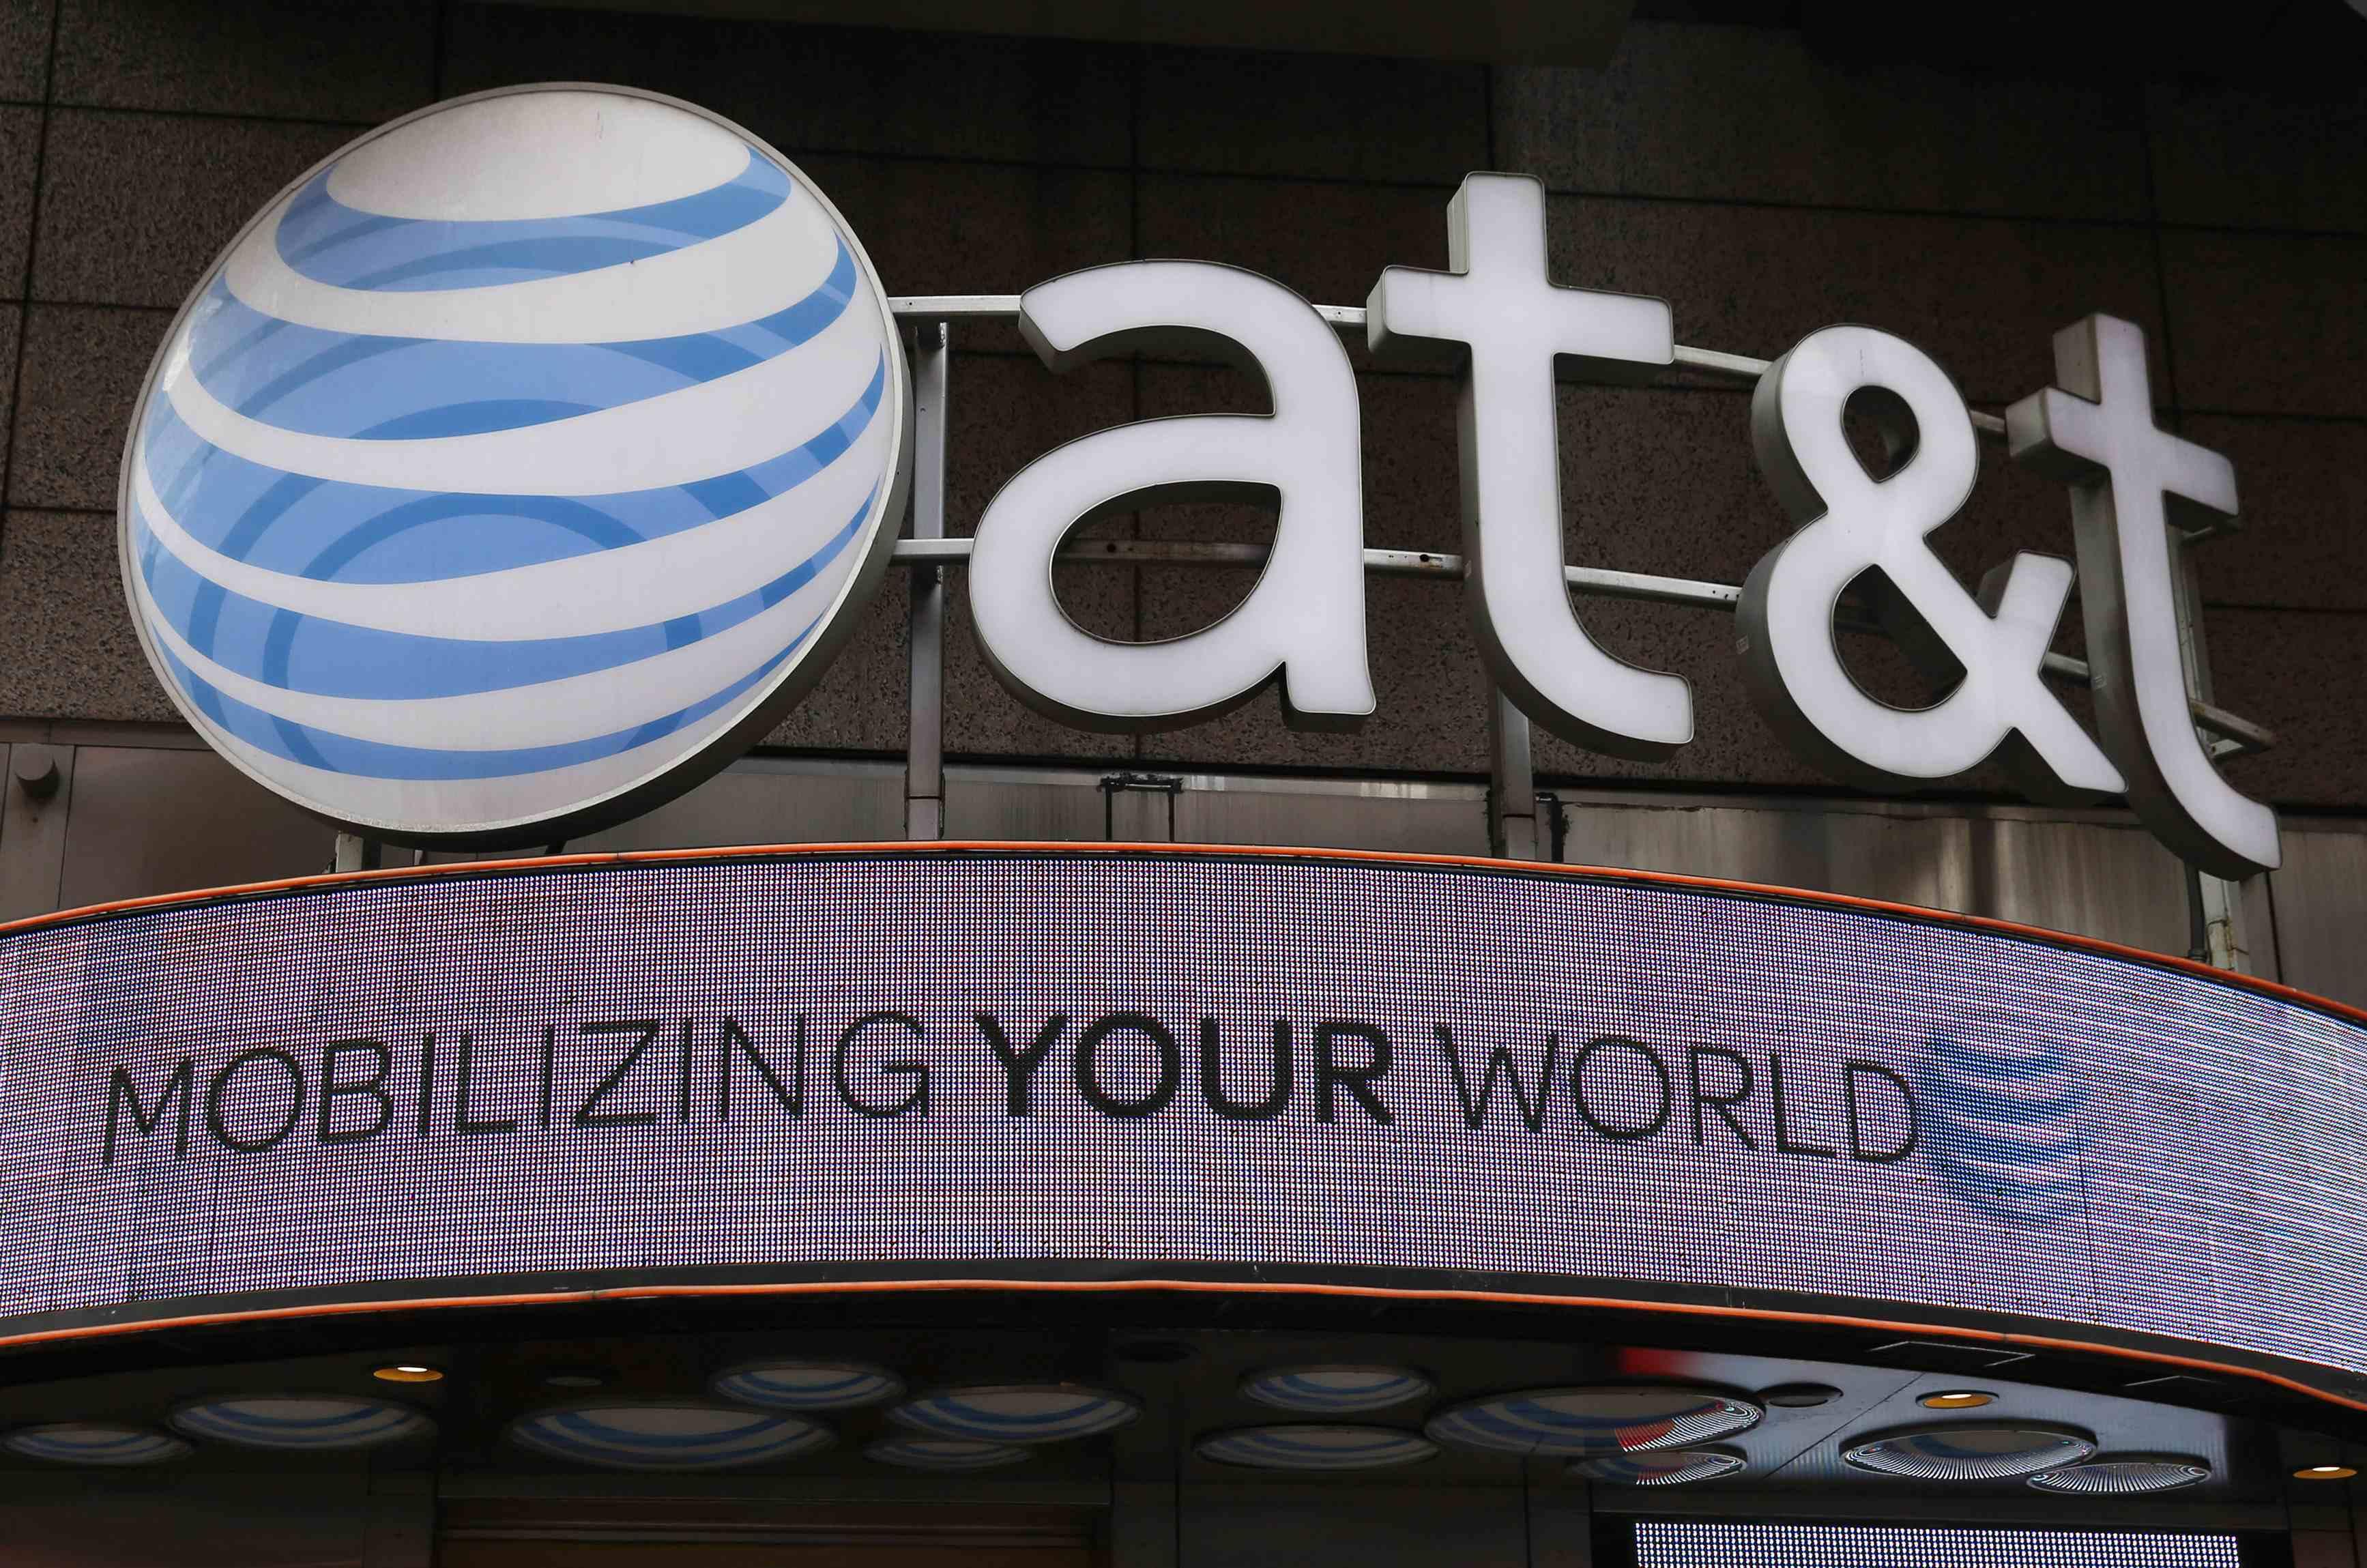 Telefónica, interesado en comprar activos de AT&T en Latinoamérica